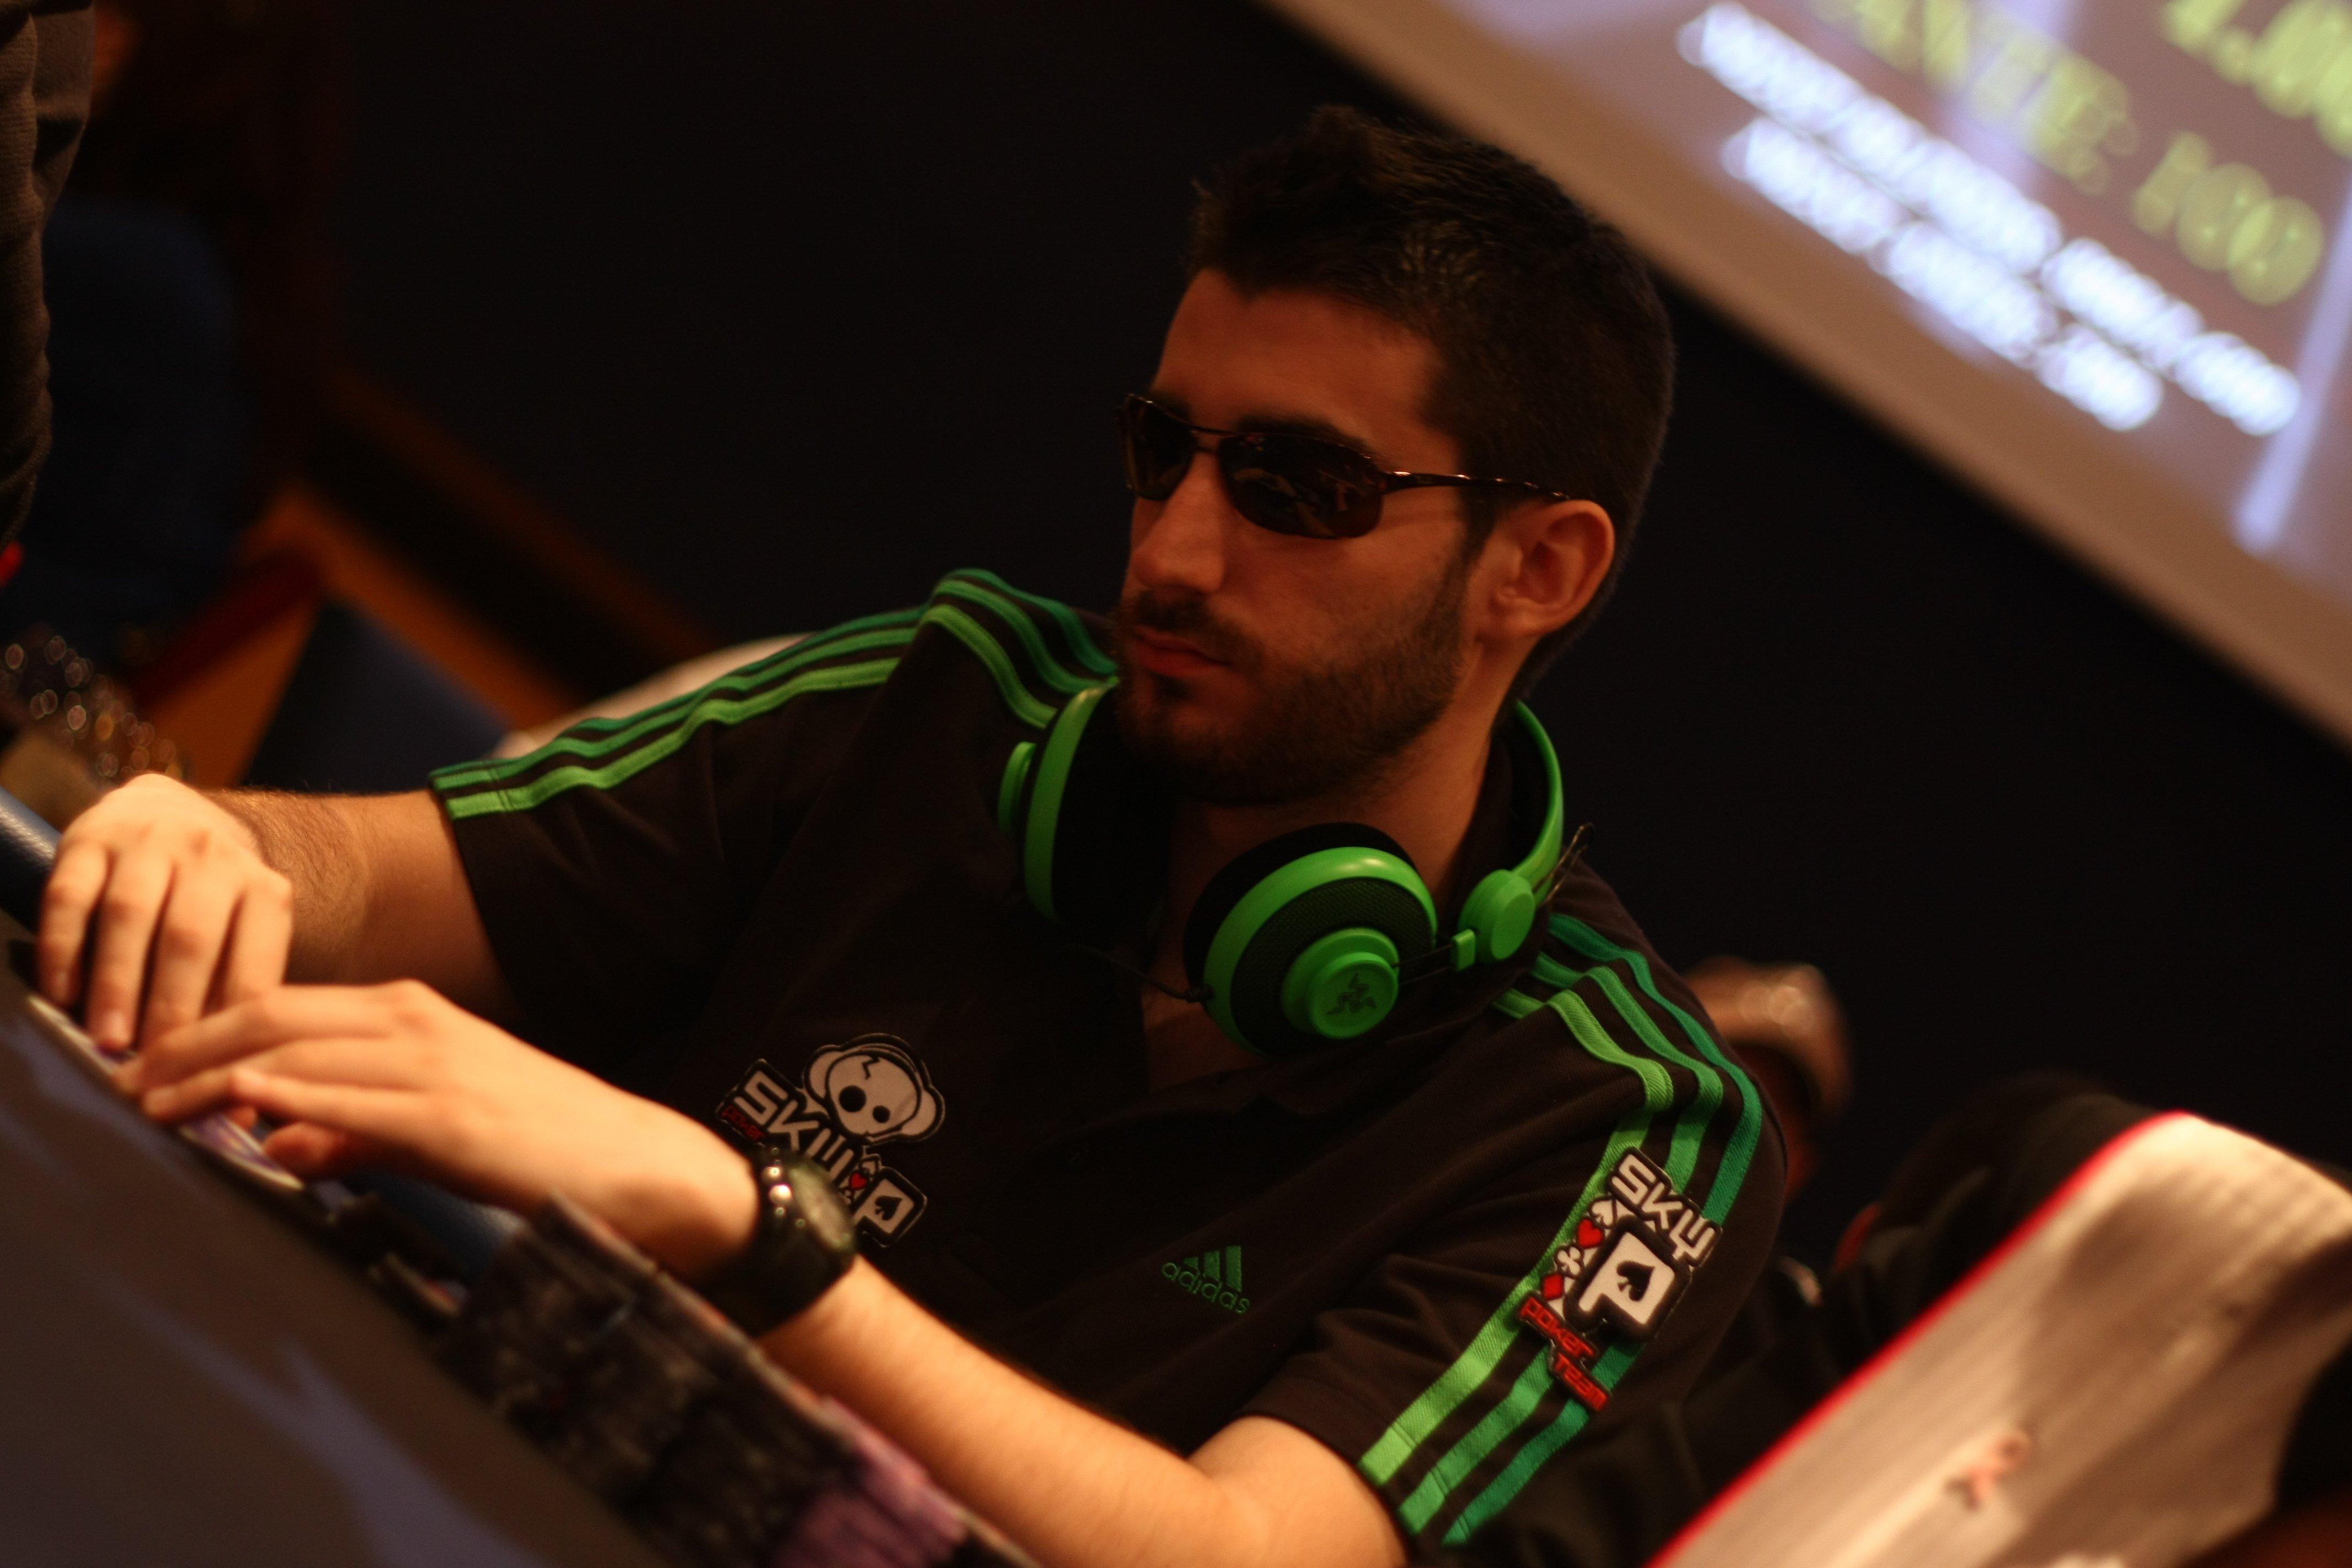 Pokerstars school los mejores casino online Málaga - 36209